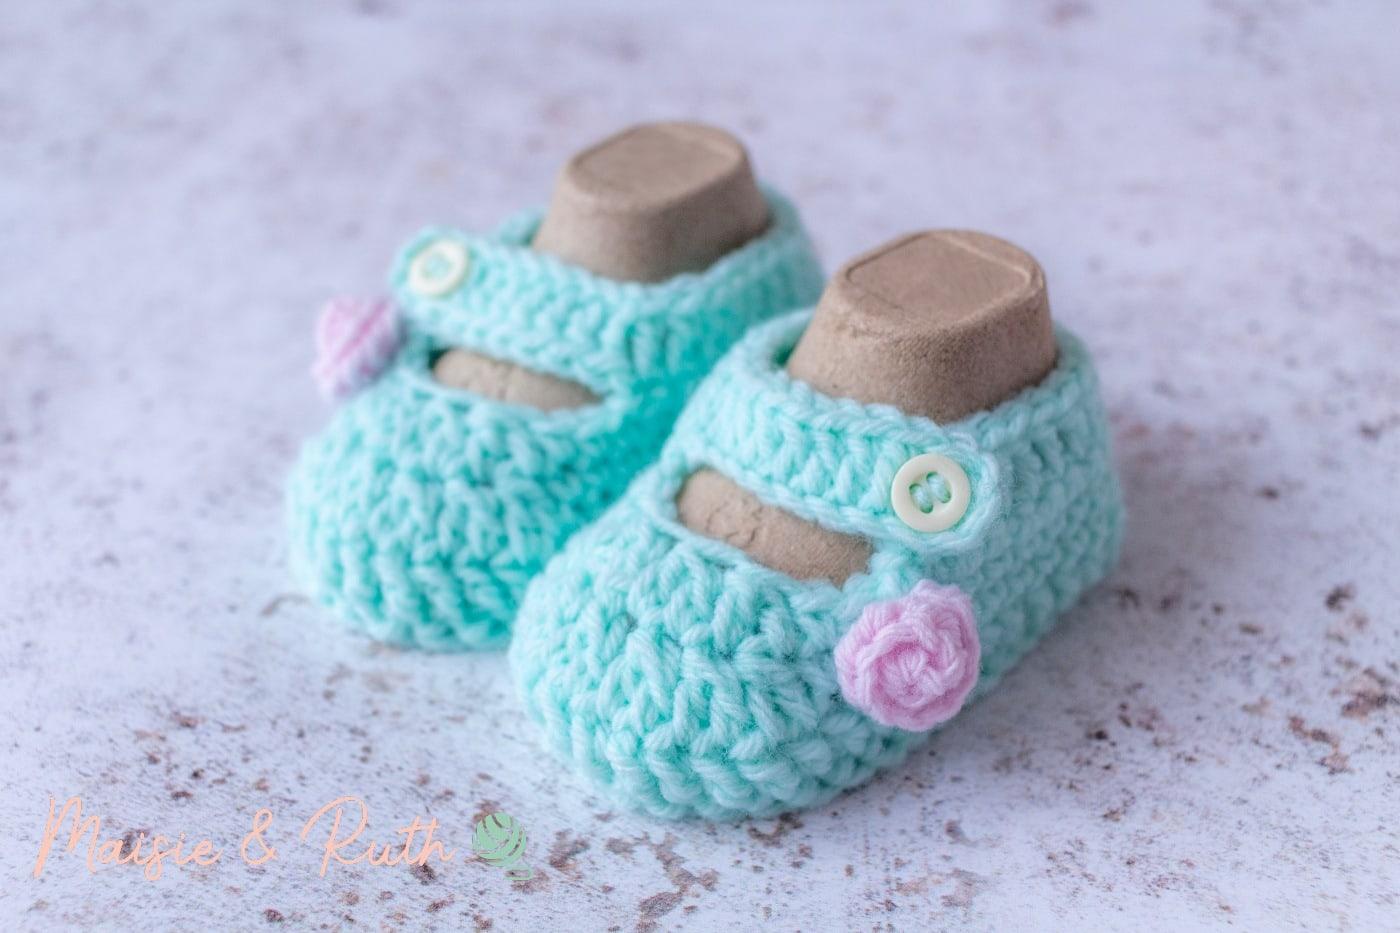 Crochet Baby Booties Pattern Final Image 1